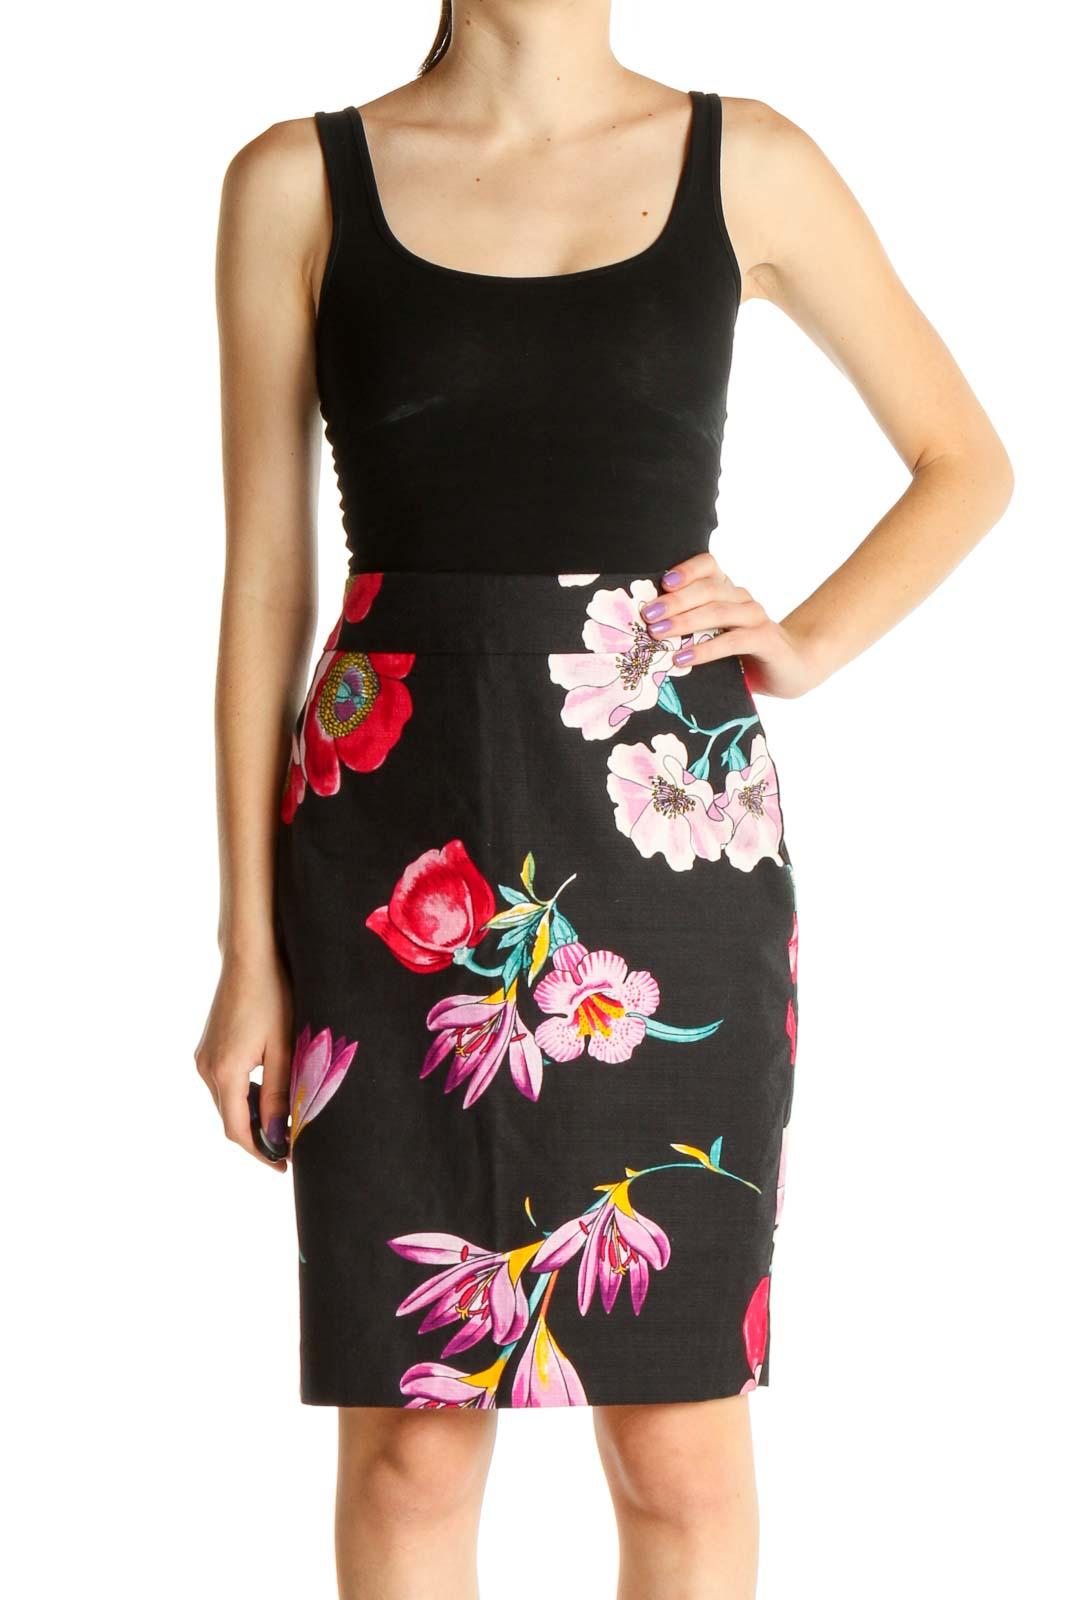 Black Floral Print Chic Pencil Skirt Front